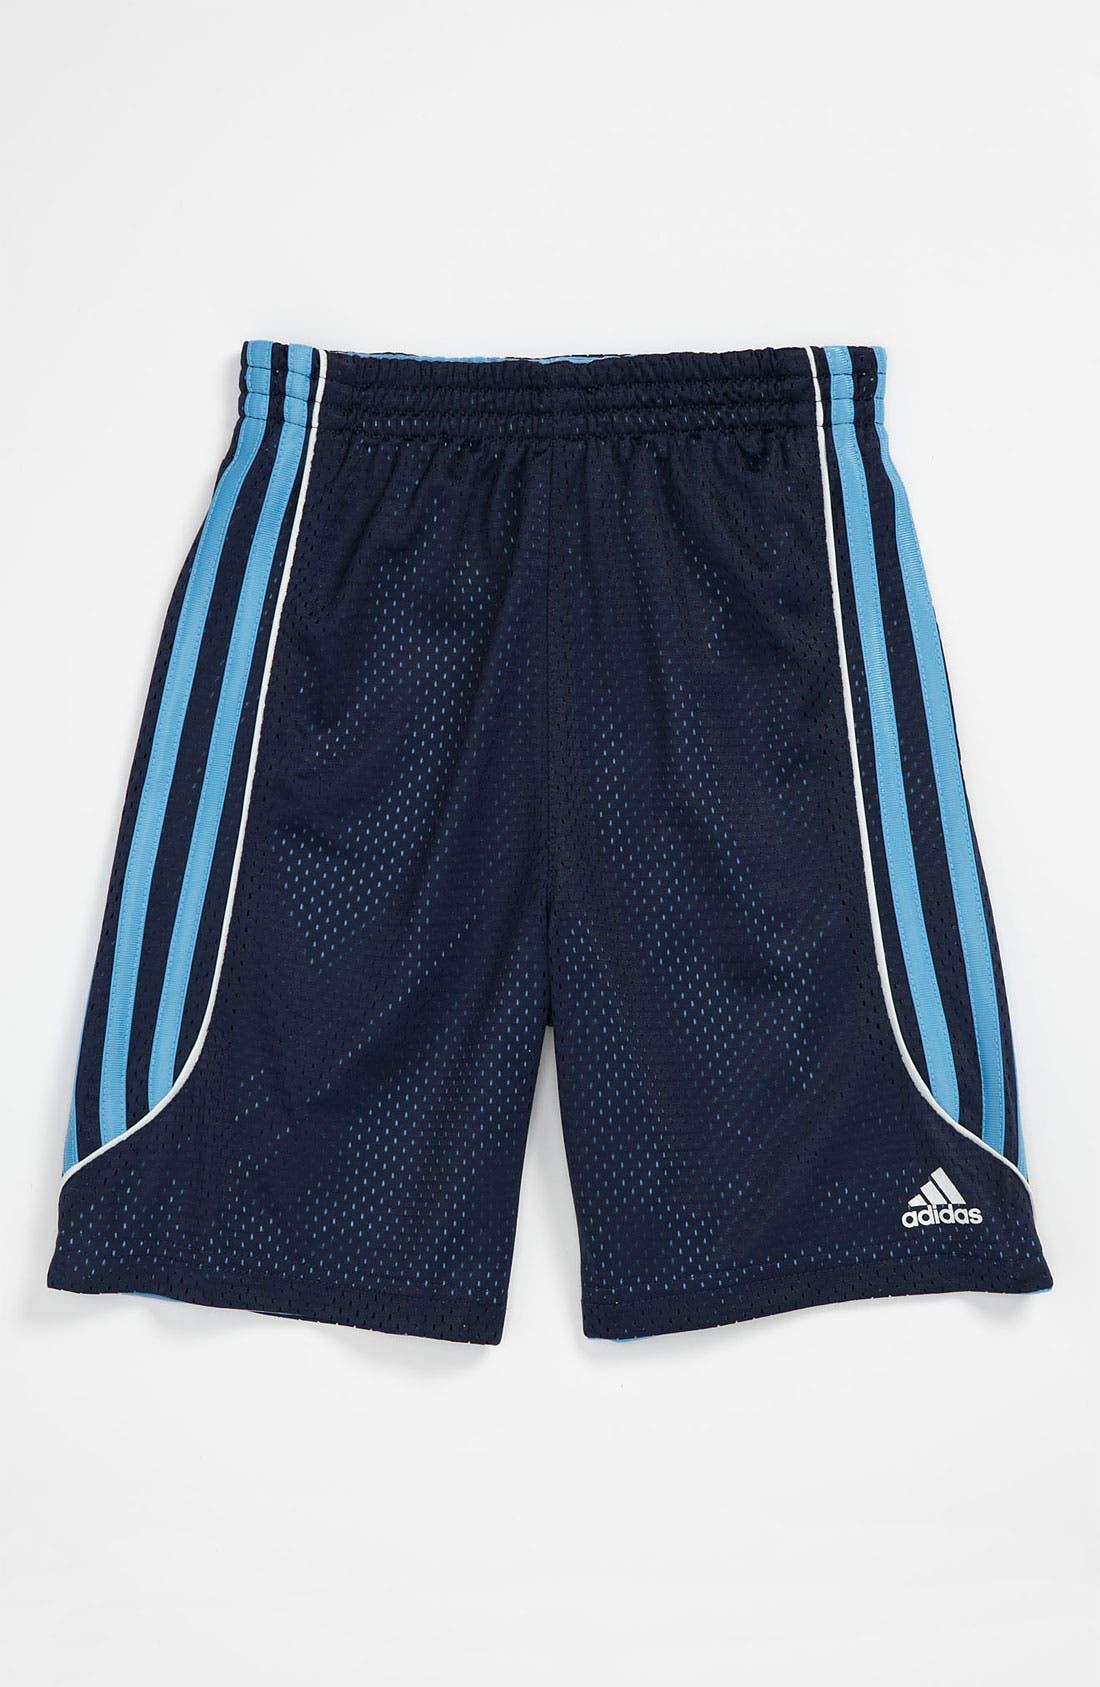 Main Image - adidas 'Flip Side' Reversible Shorts (Little Boys)